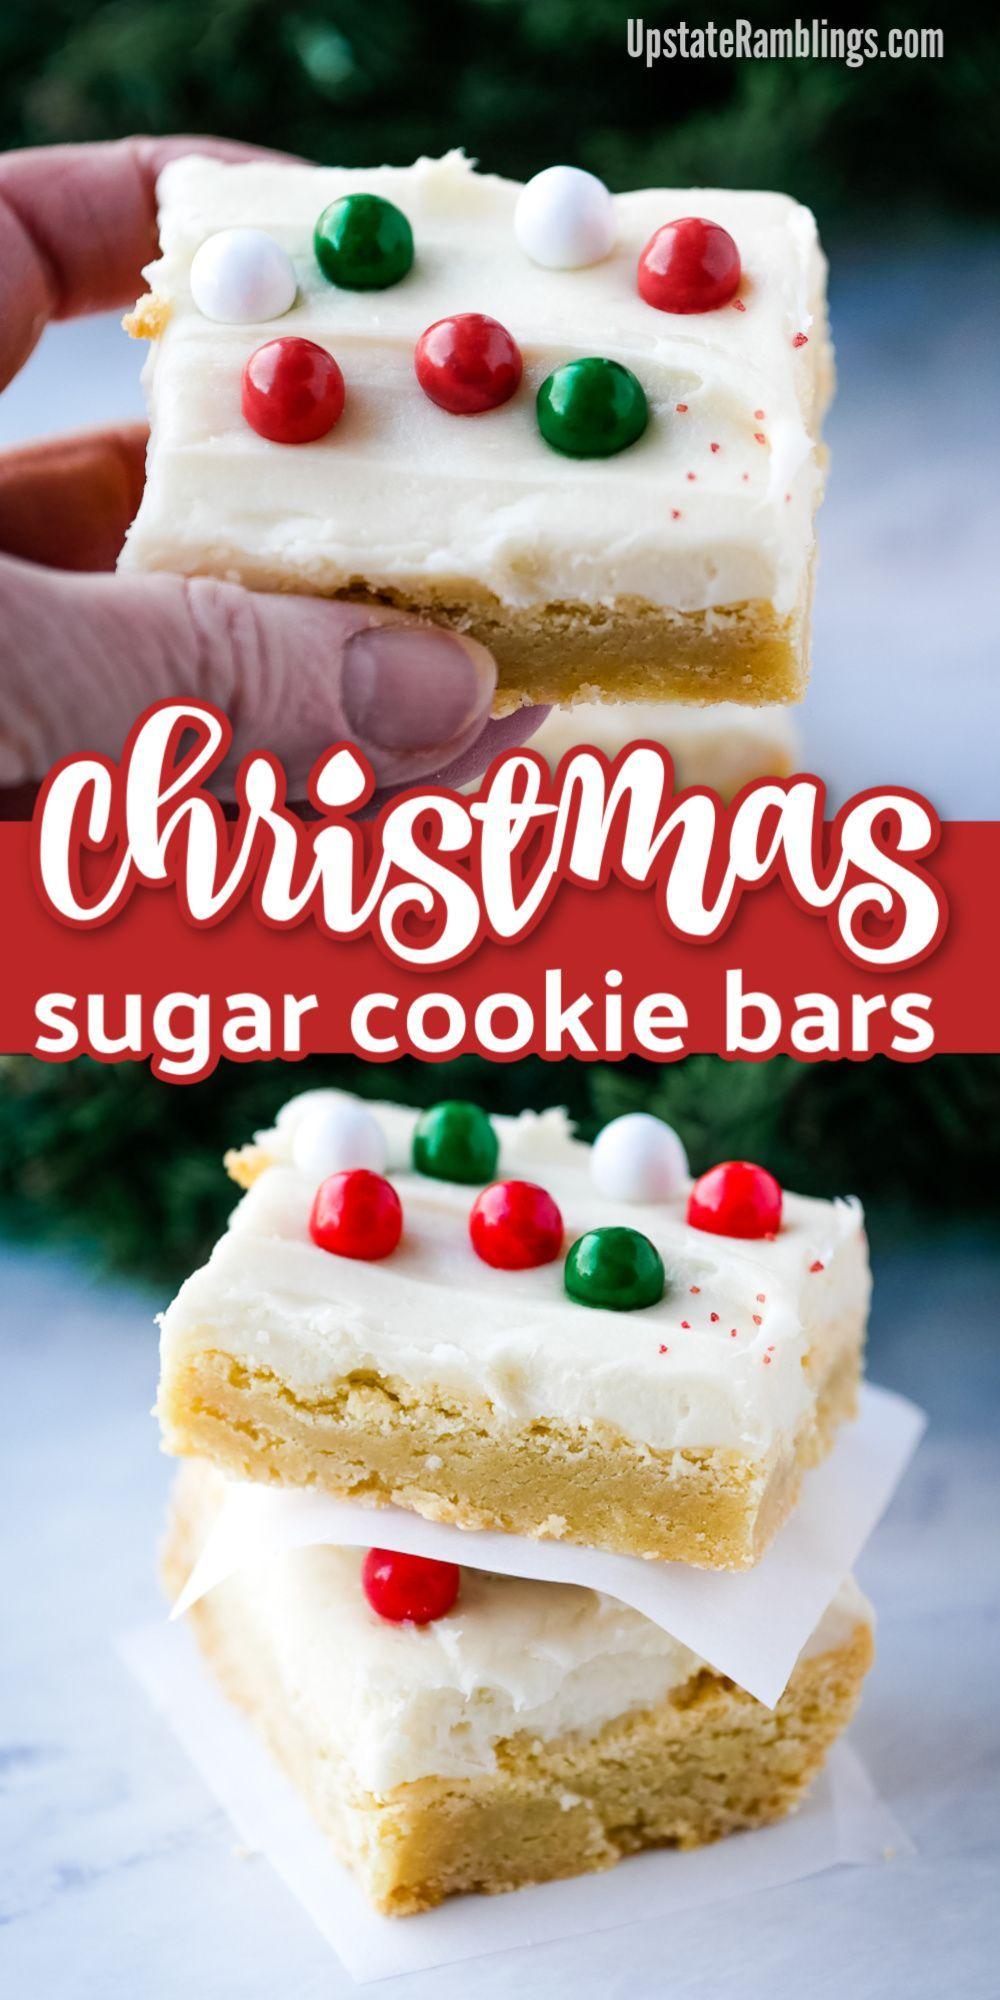 Christmas Sugar Cookie Bars - Anne G - Christmas Sugar Cookie Bars        These Sugar Cookie Bars a